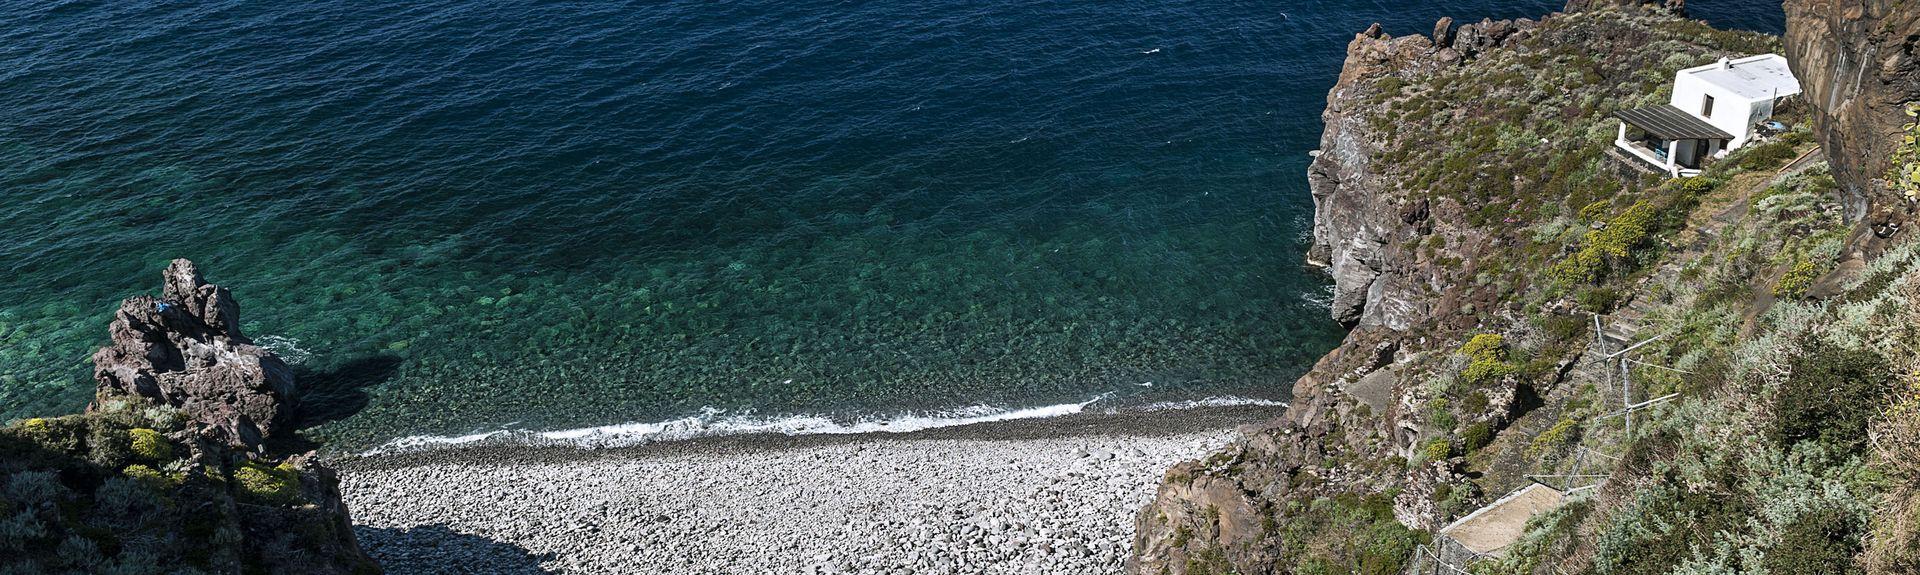 Eoliennes, Italie